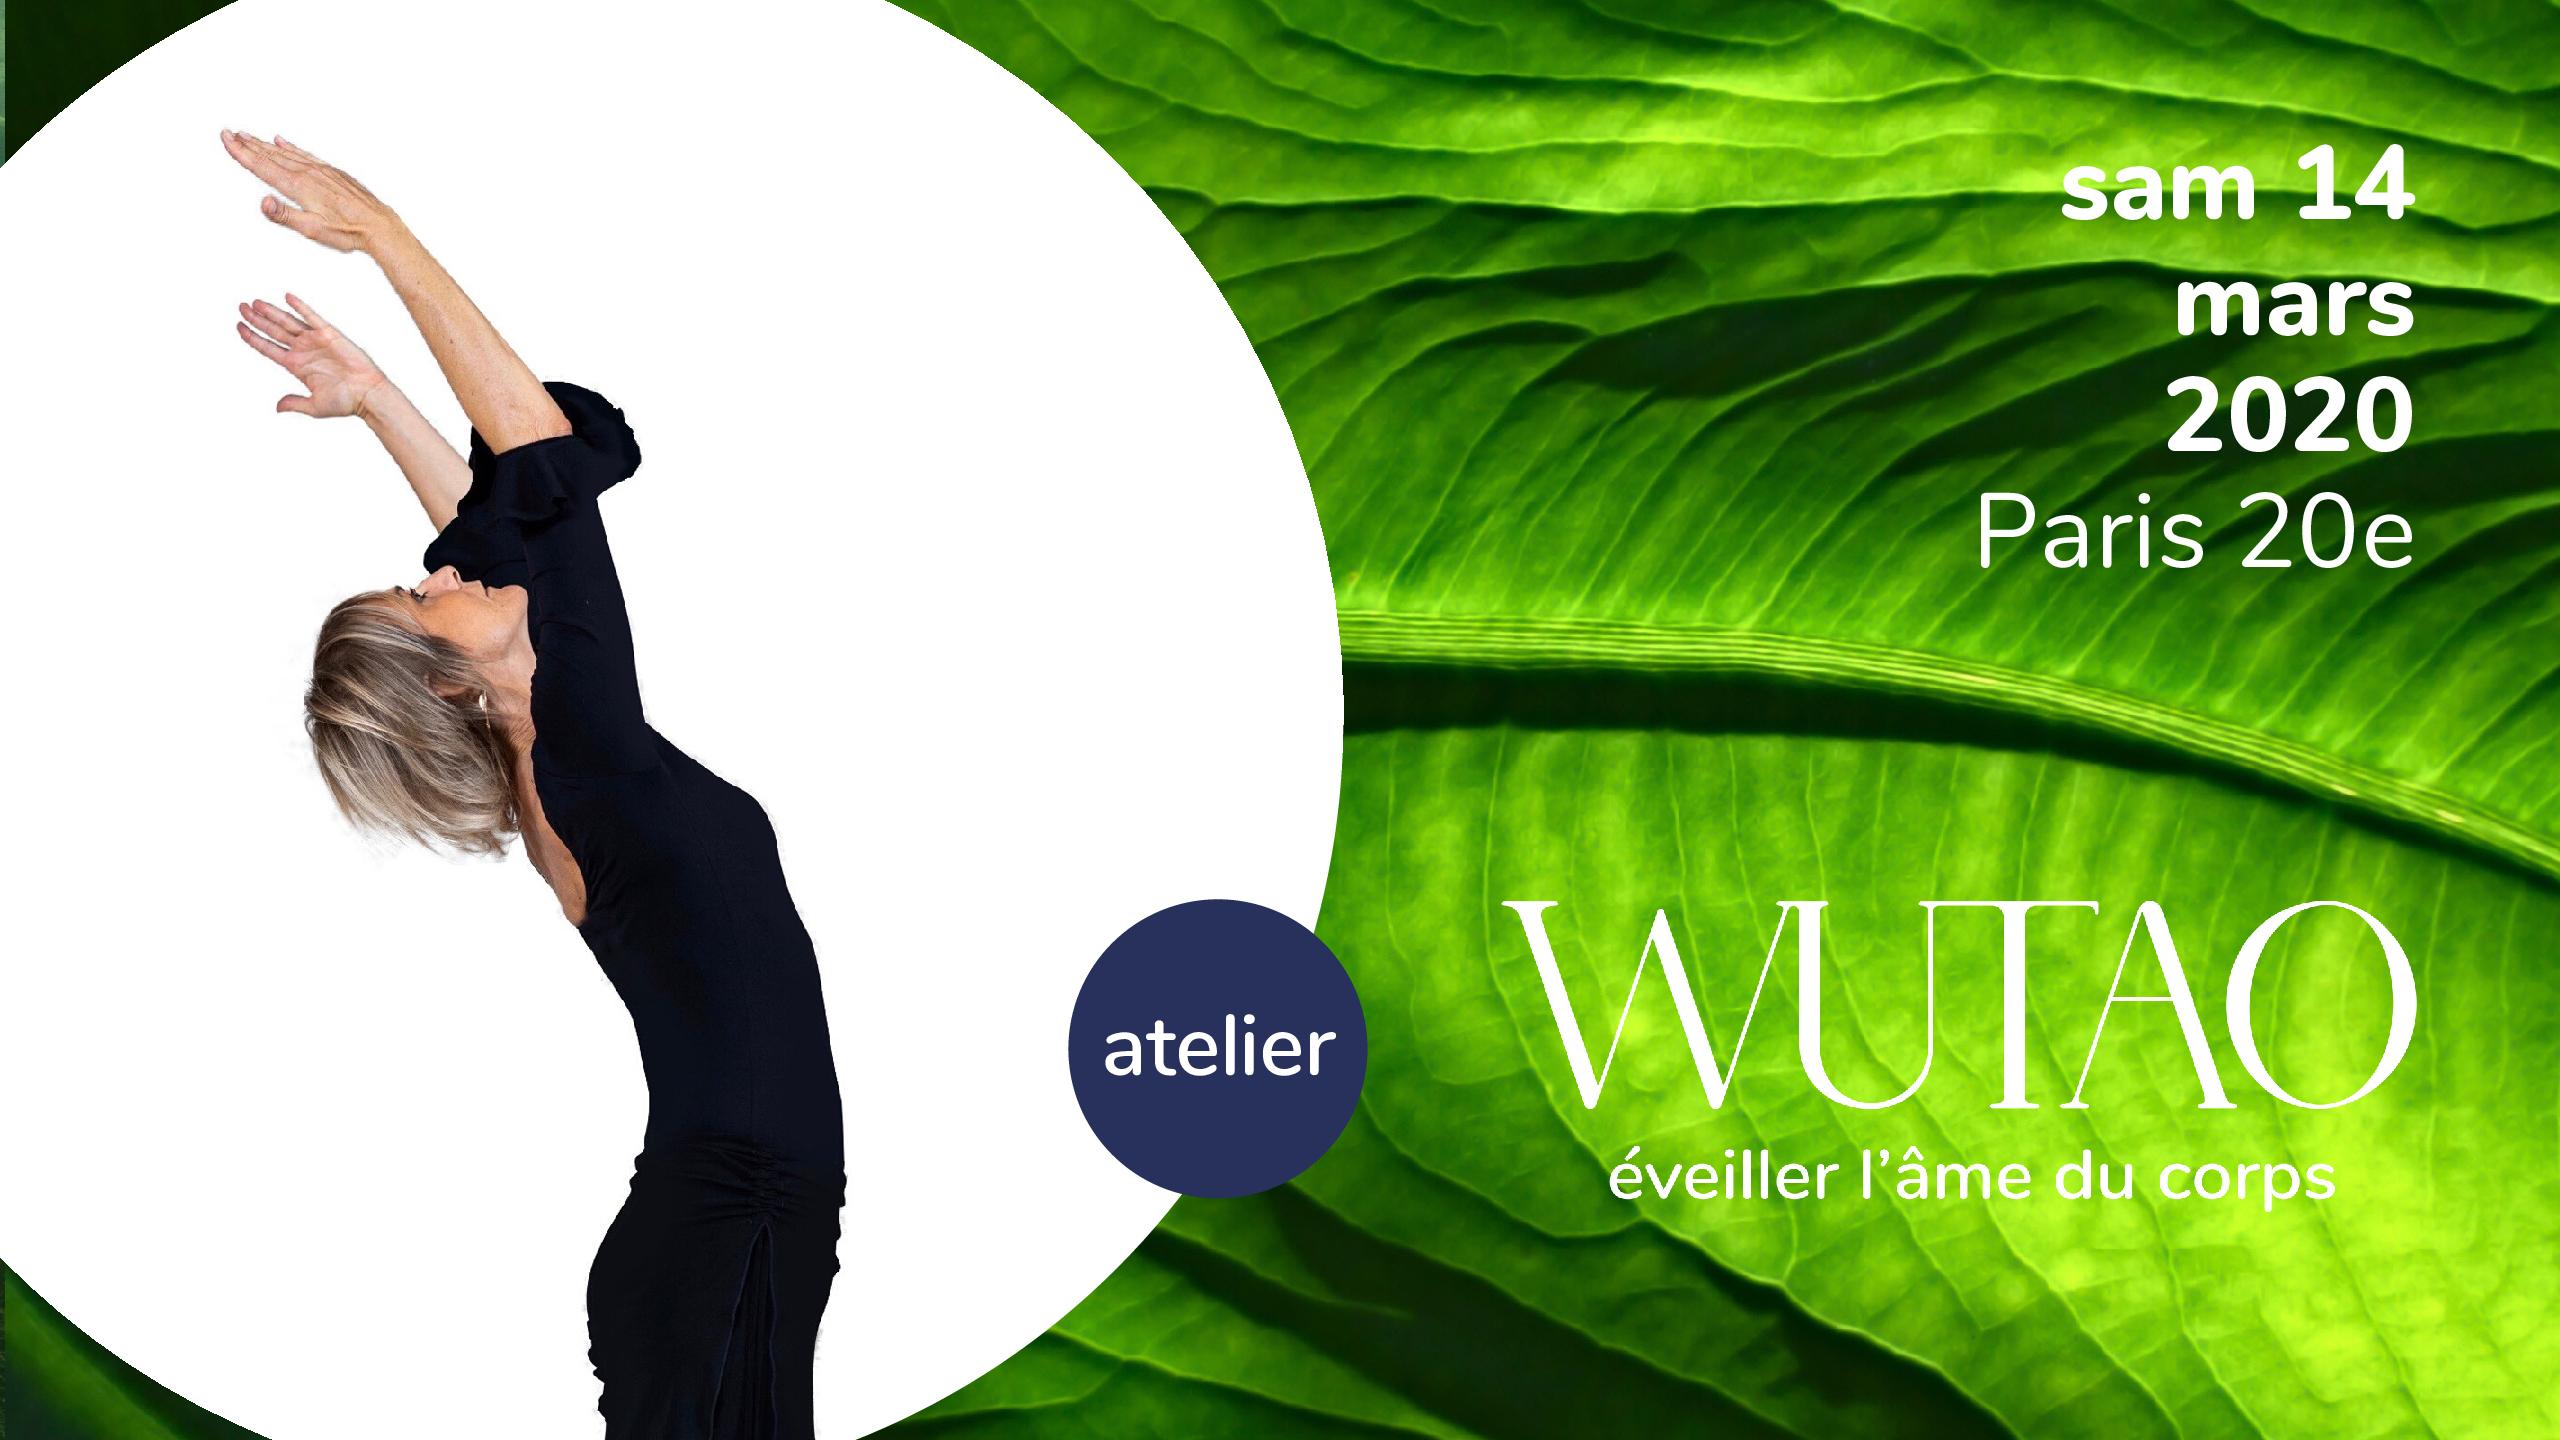 Atelier de WUTAO® sam 14 mars 10h30-12h30